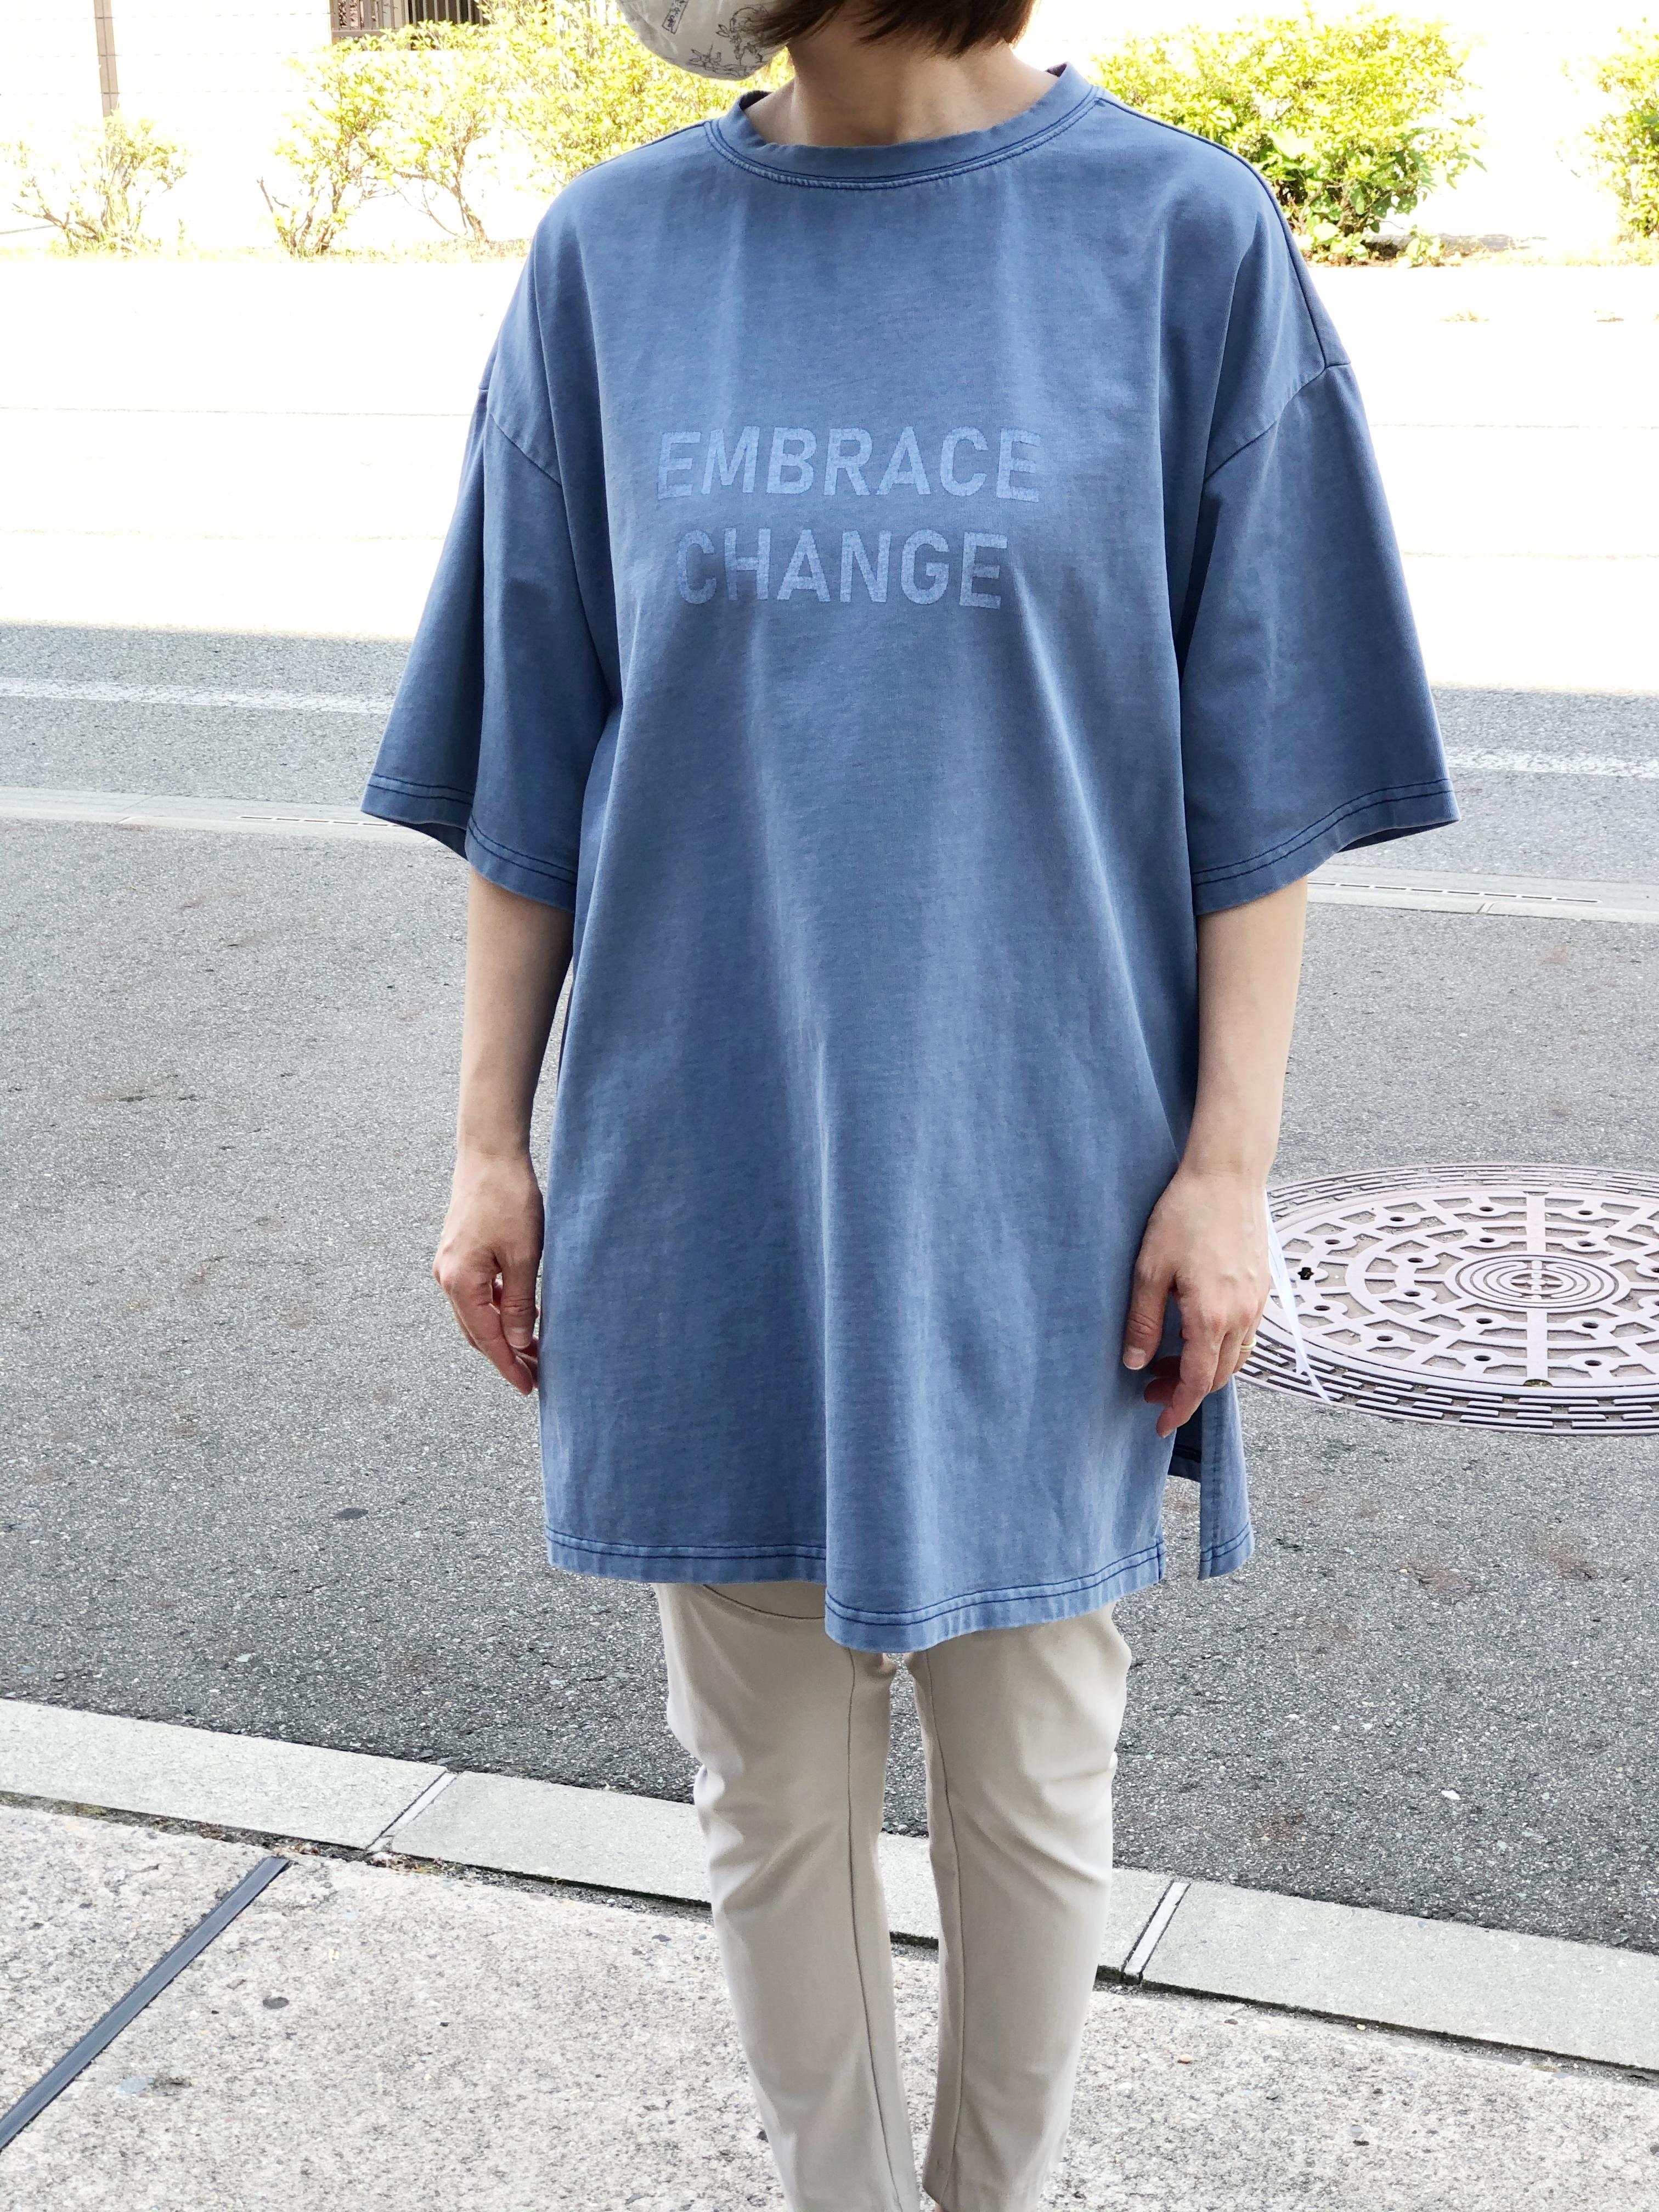 Dignite Collier/802313/後染めTシャツ(ブルー)